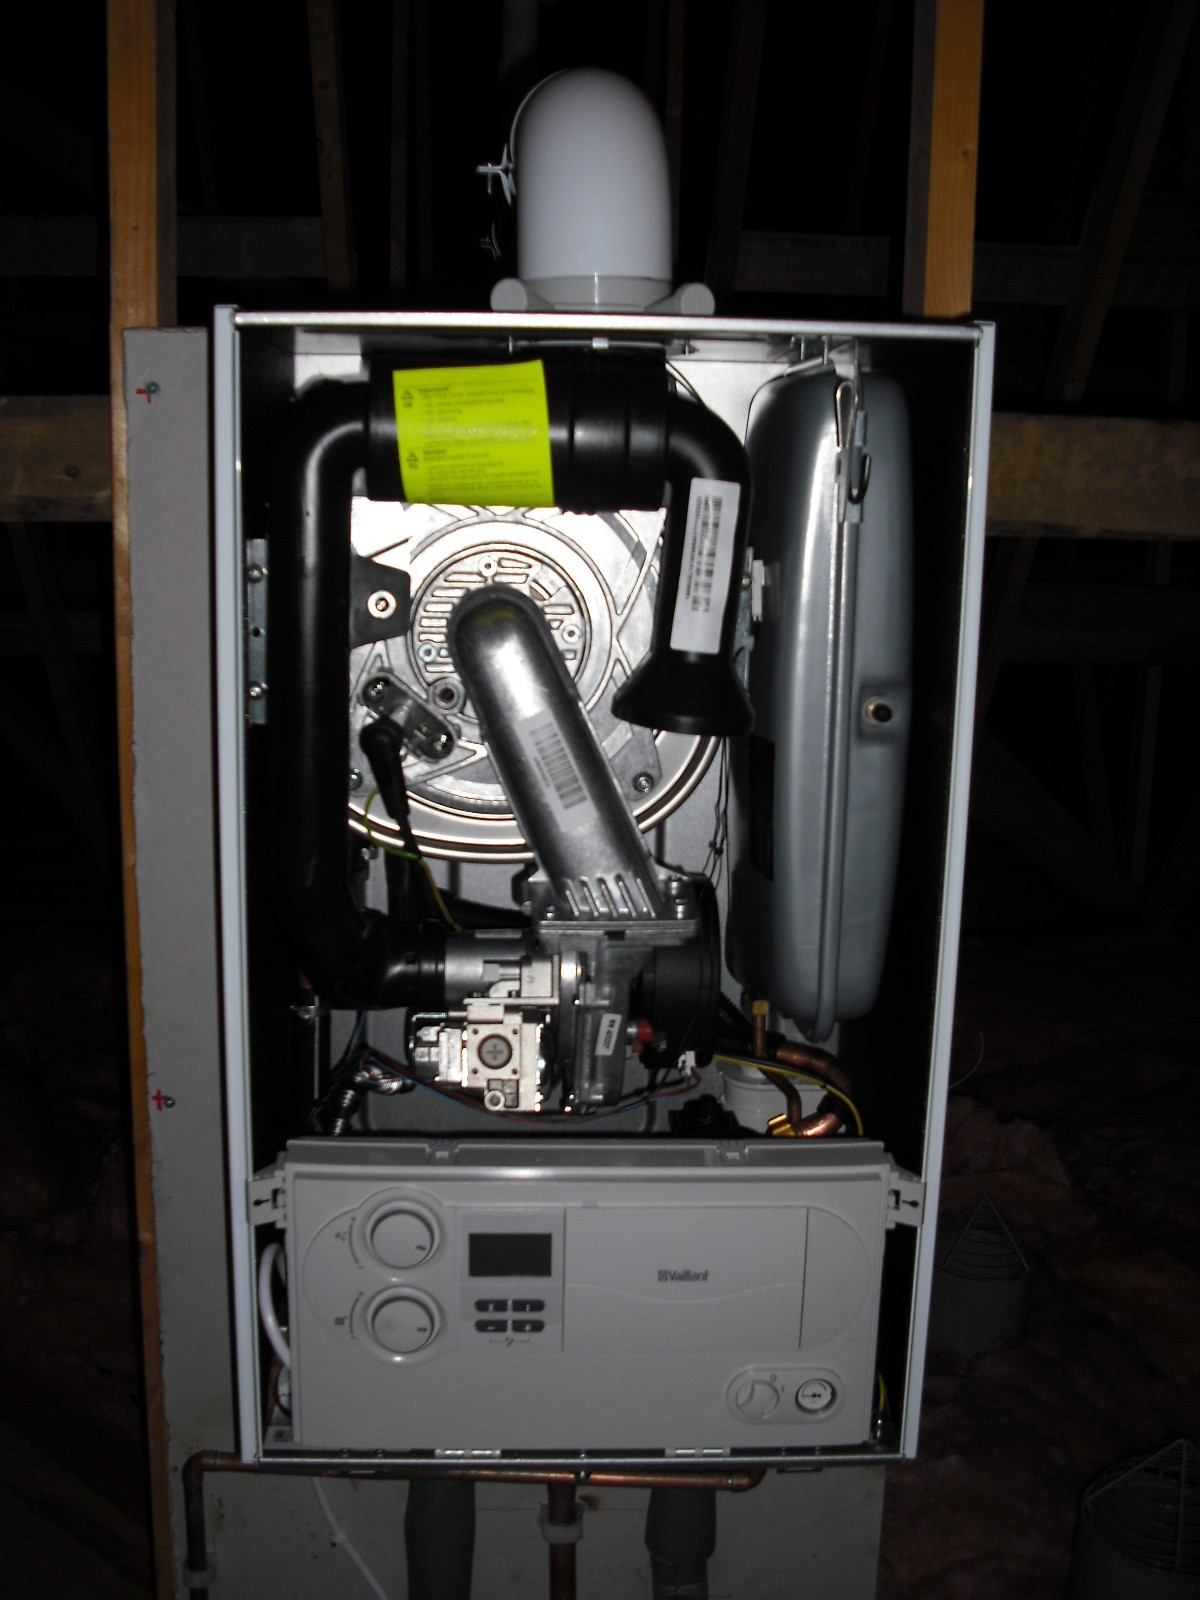 New Vaillant 6 Series System Boiler In Loft Nutfield